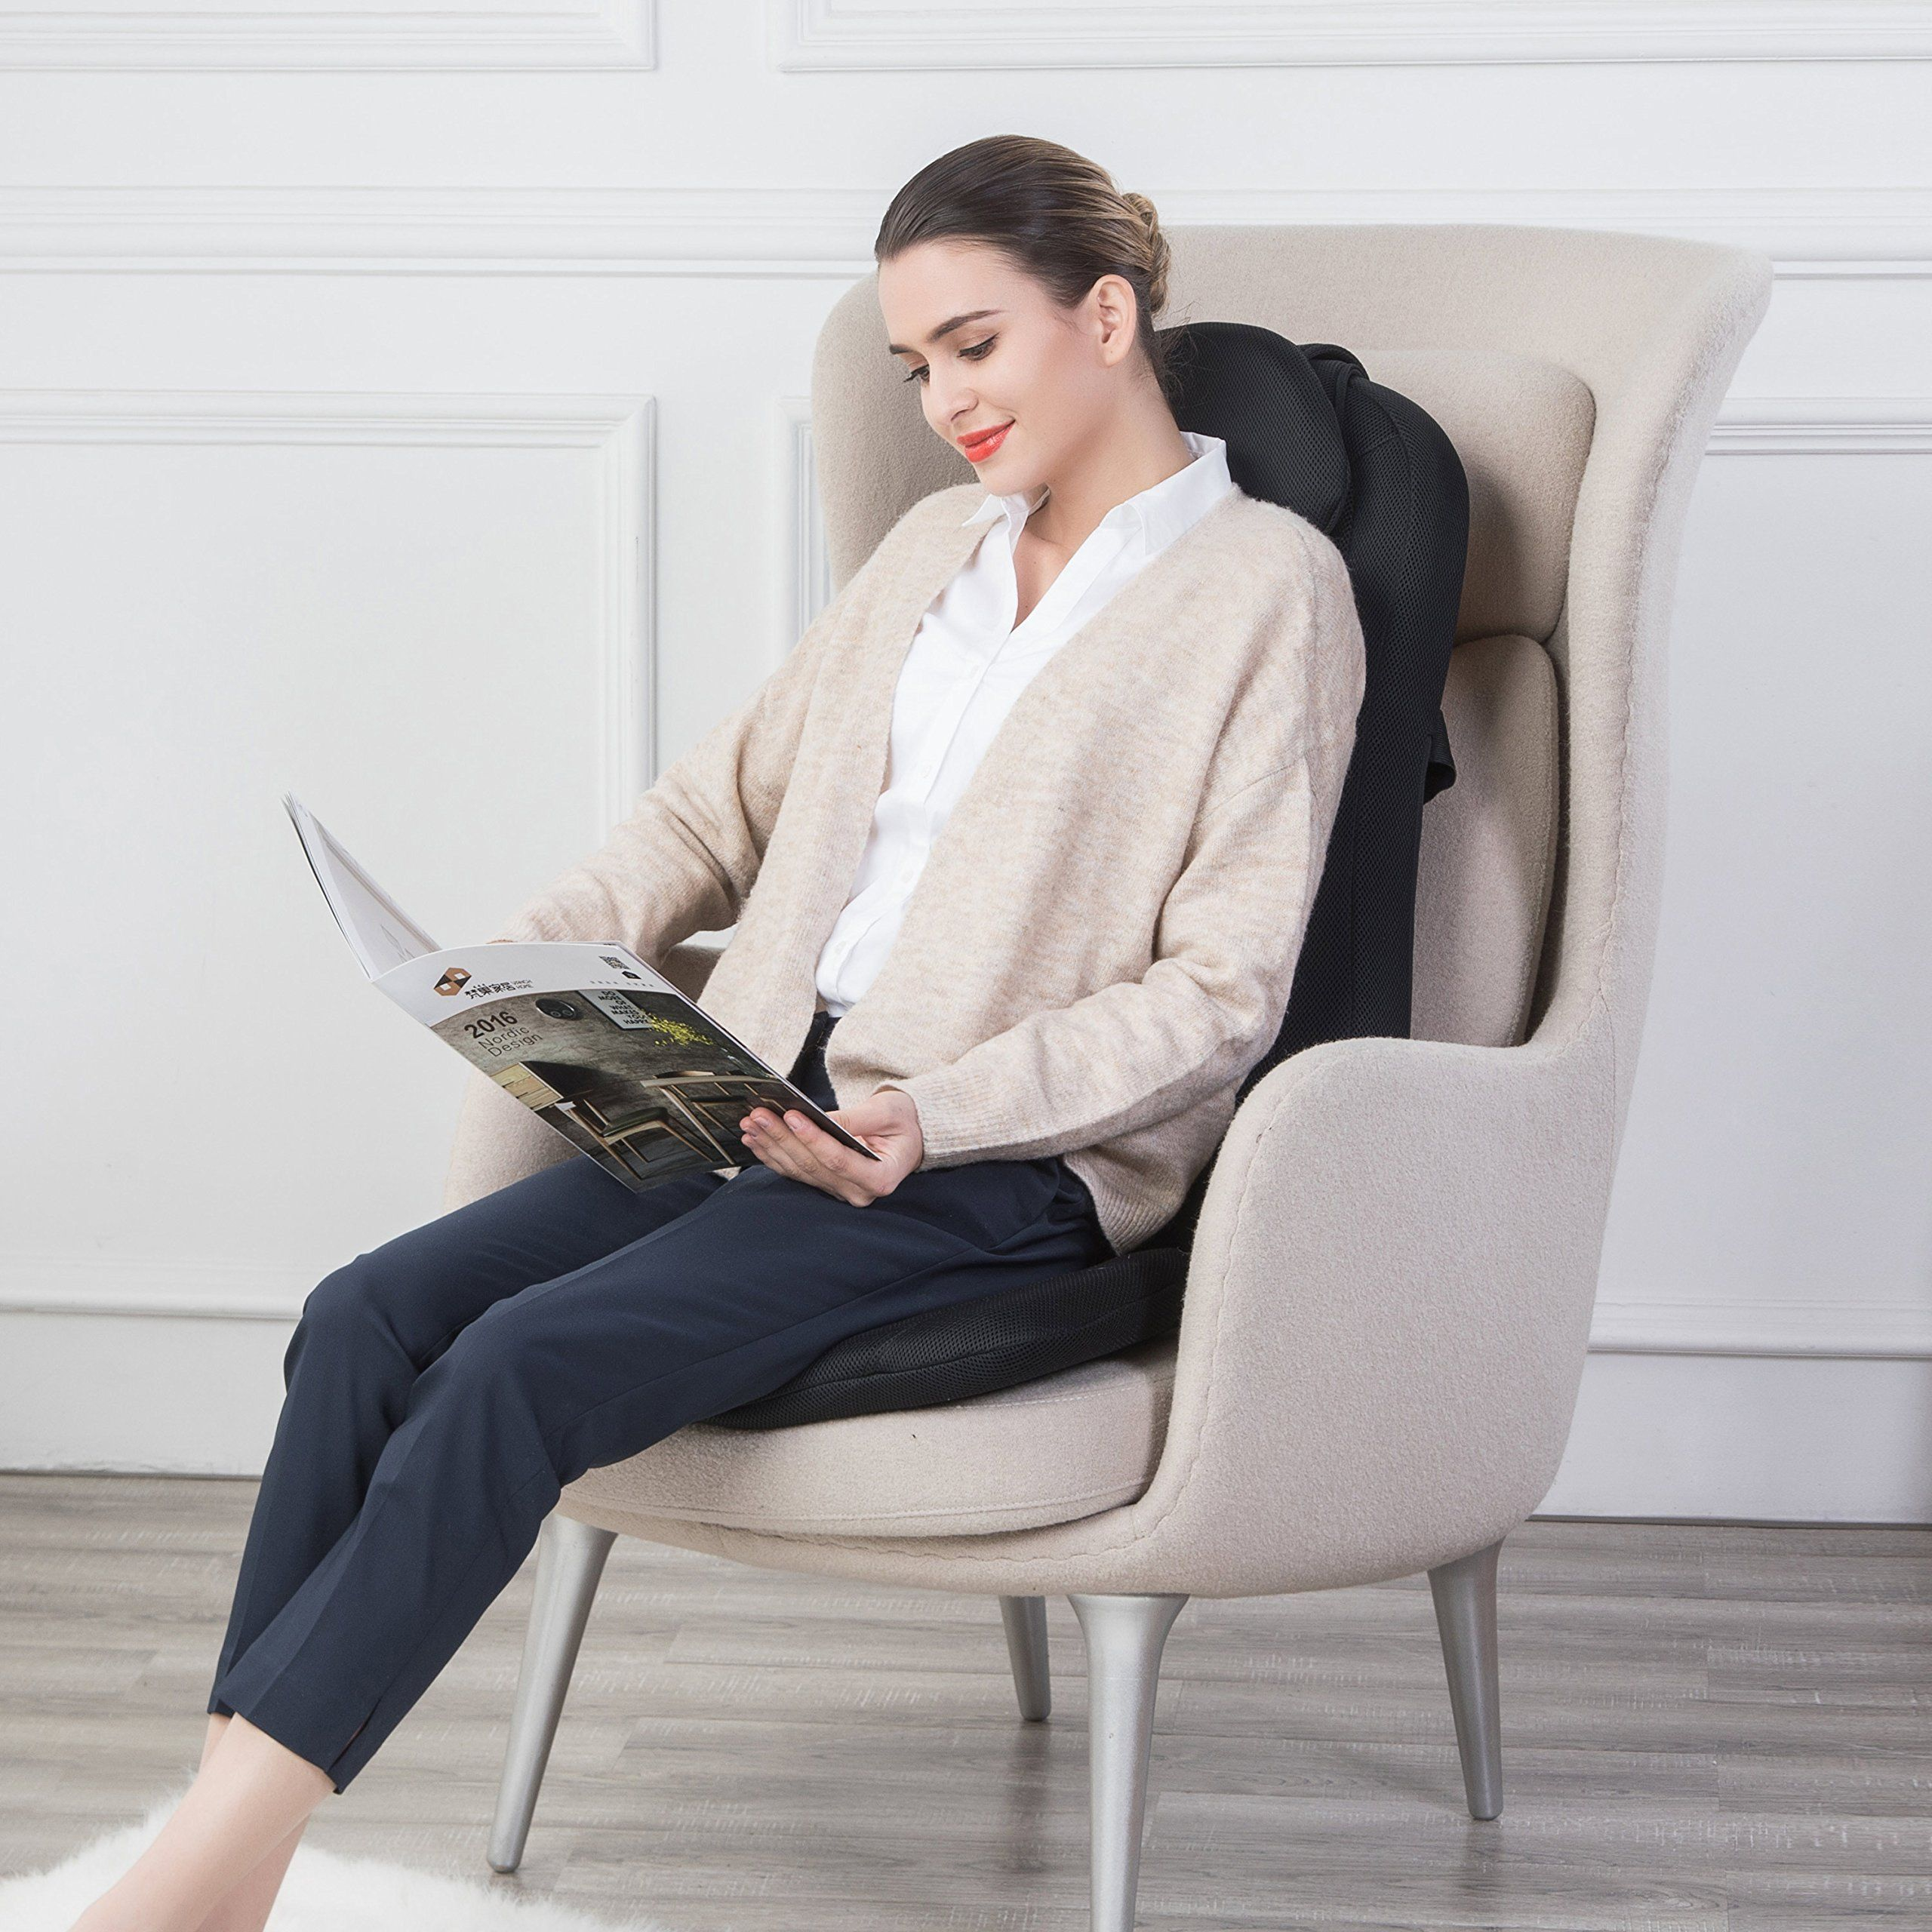 Snailax Shiatsu Massage Cushion with Heat Massage Chair